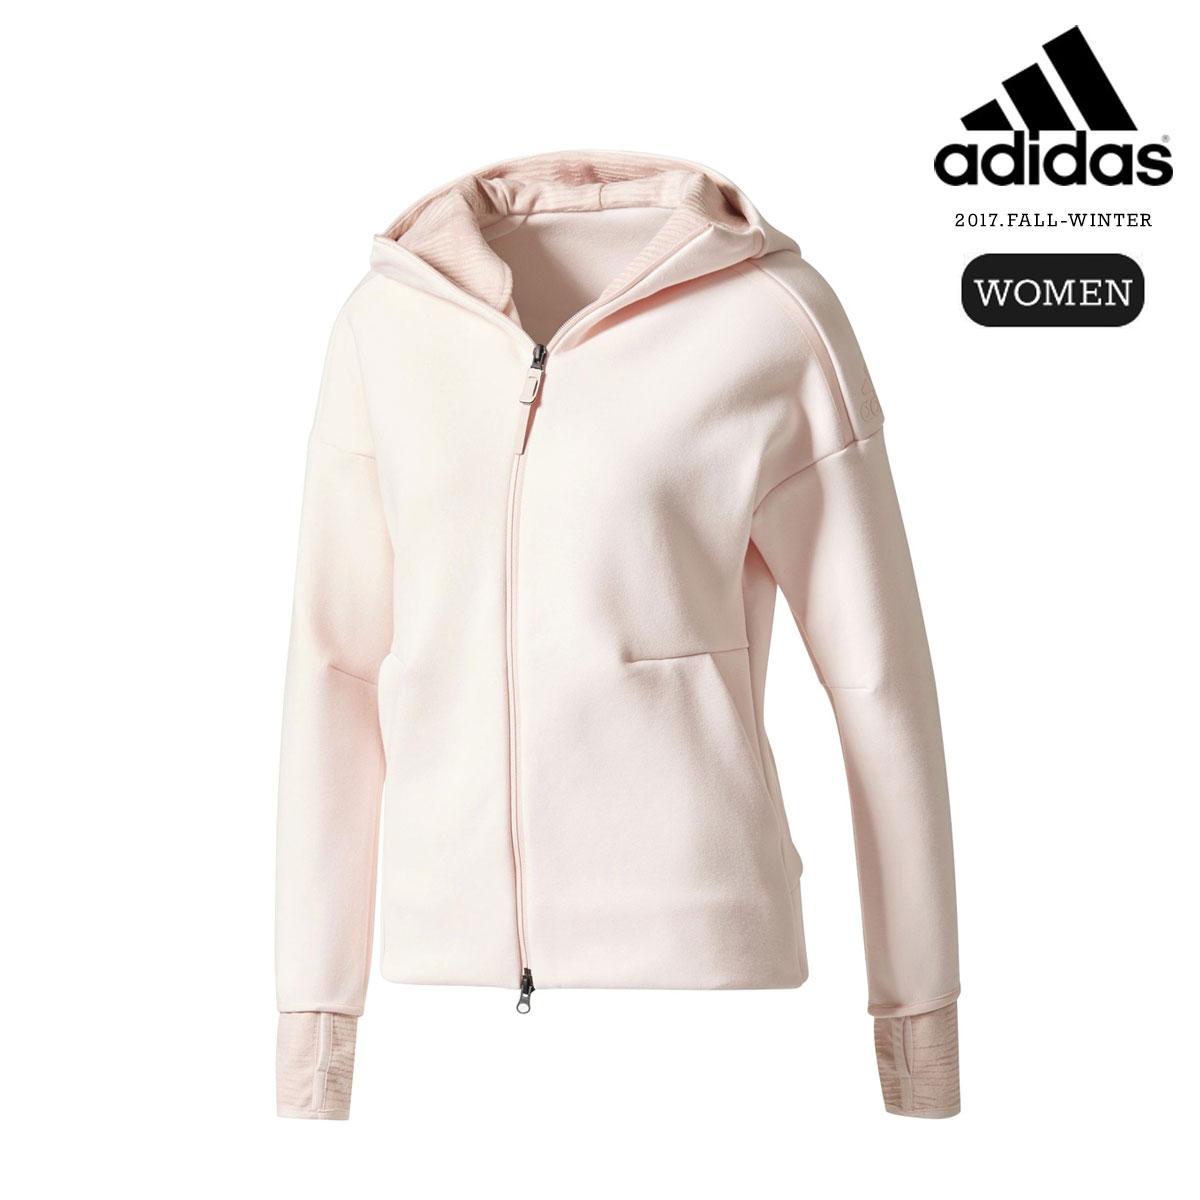 adidas W adidas Z.N.E. HOODIE PULSE (Ice Pink)